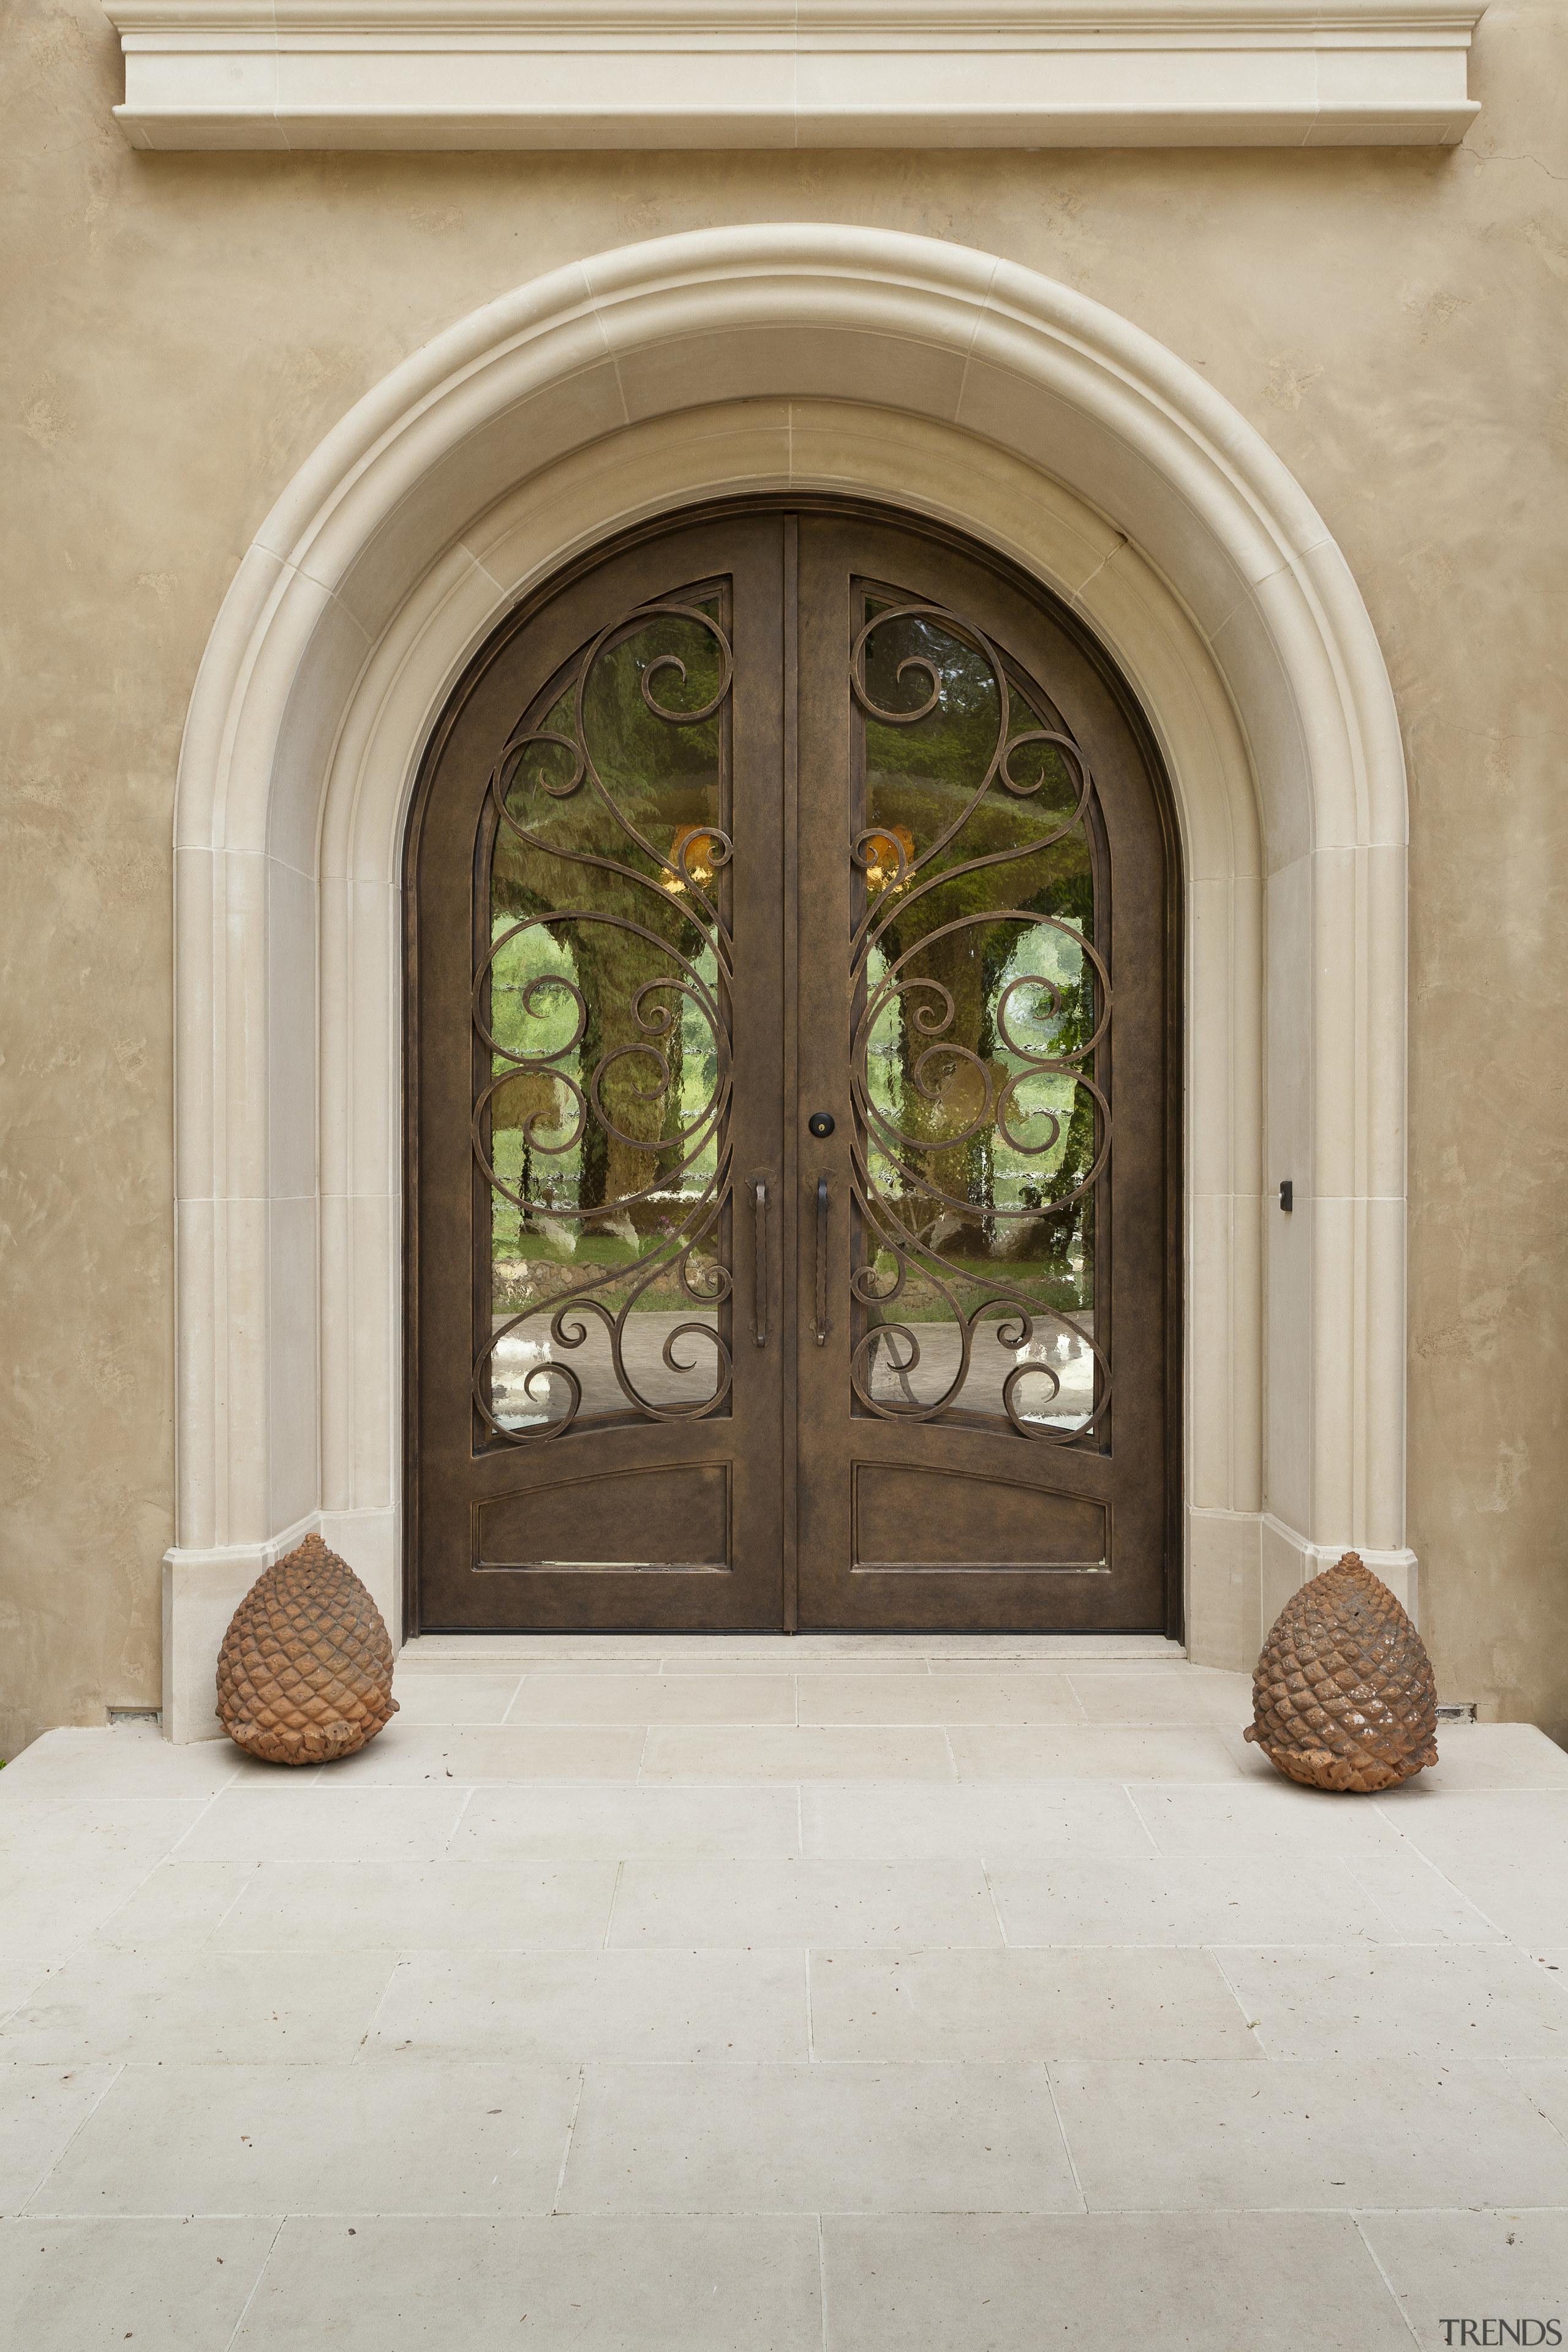 Decorative front door with limestone surround on Mediterranean-style arch, architecture, door, estate, home, window, gray, brown